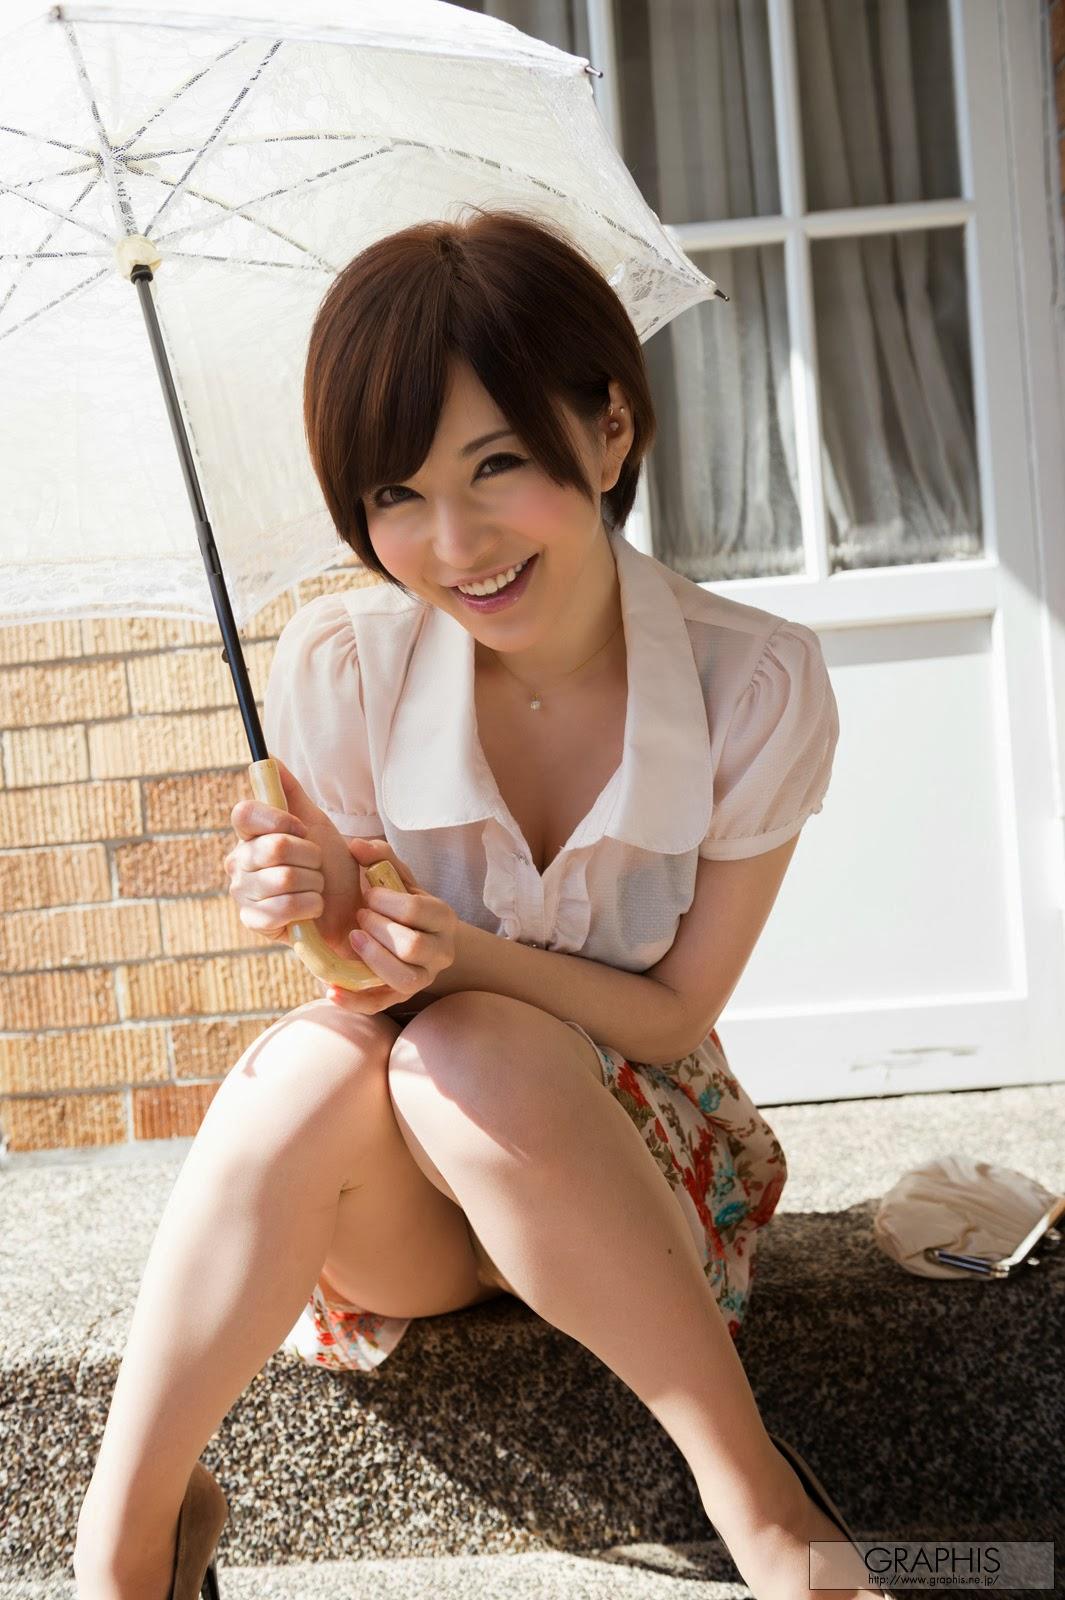 Japanese teen models photos